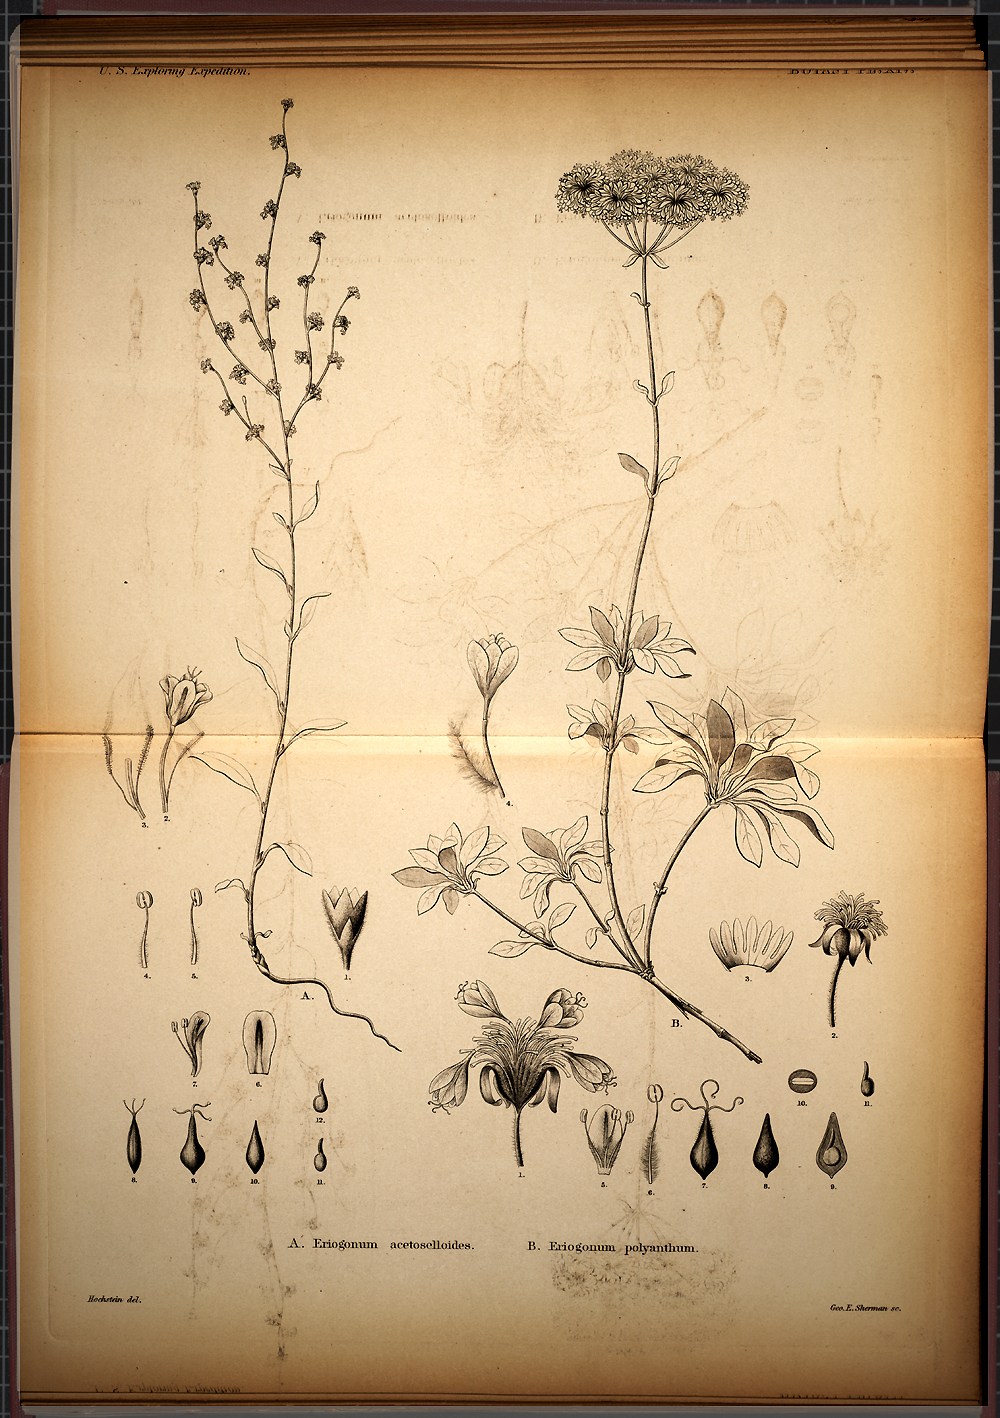 Botany, Plate XIV,  Image number:SIL19-28-051